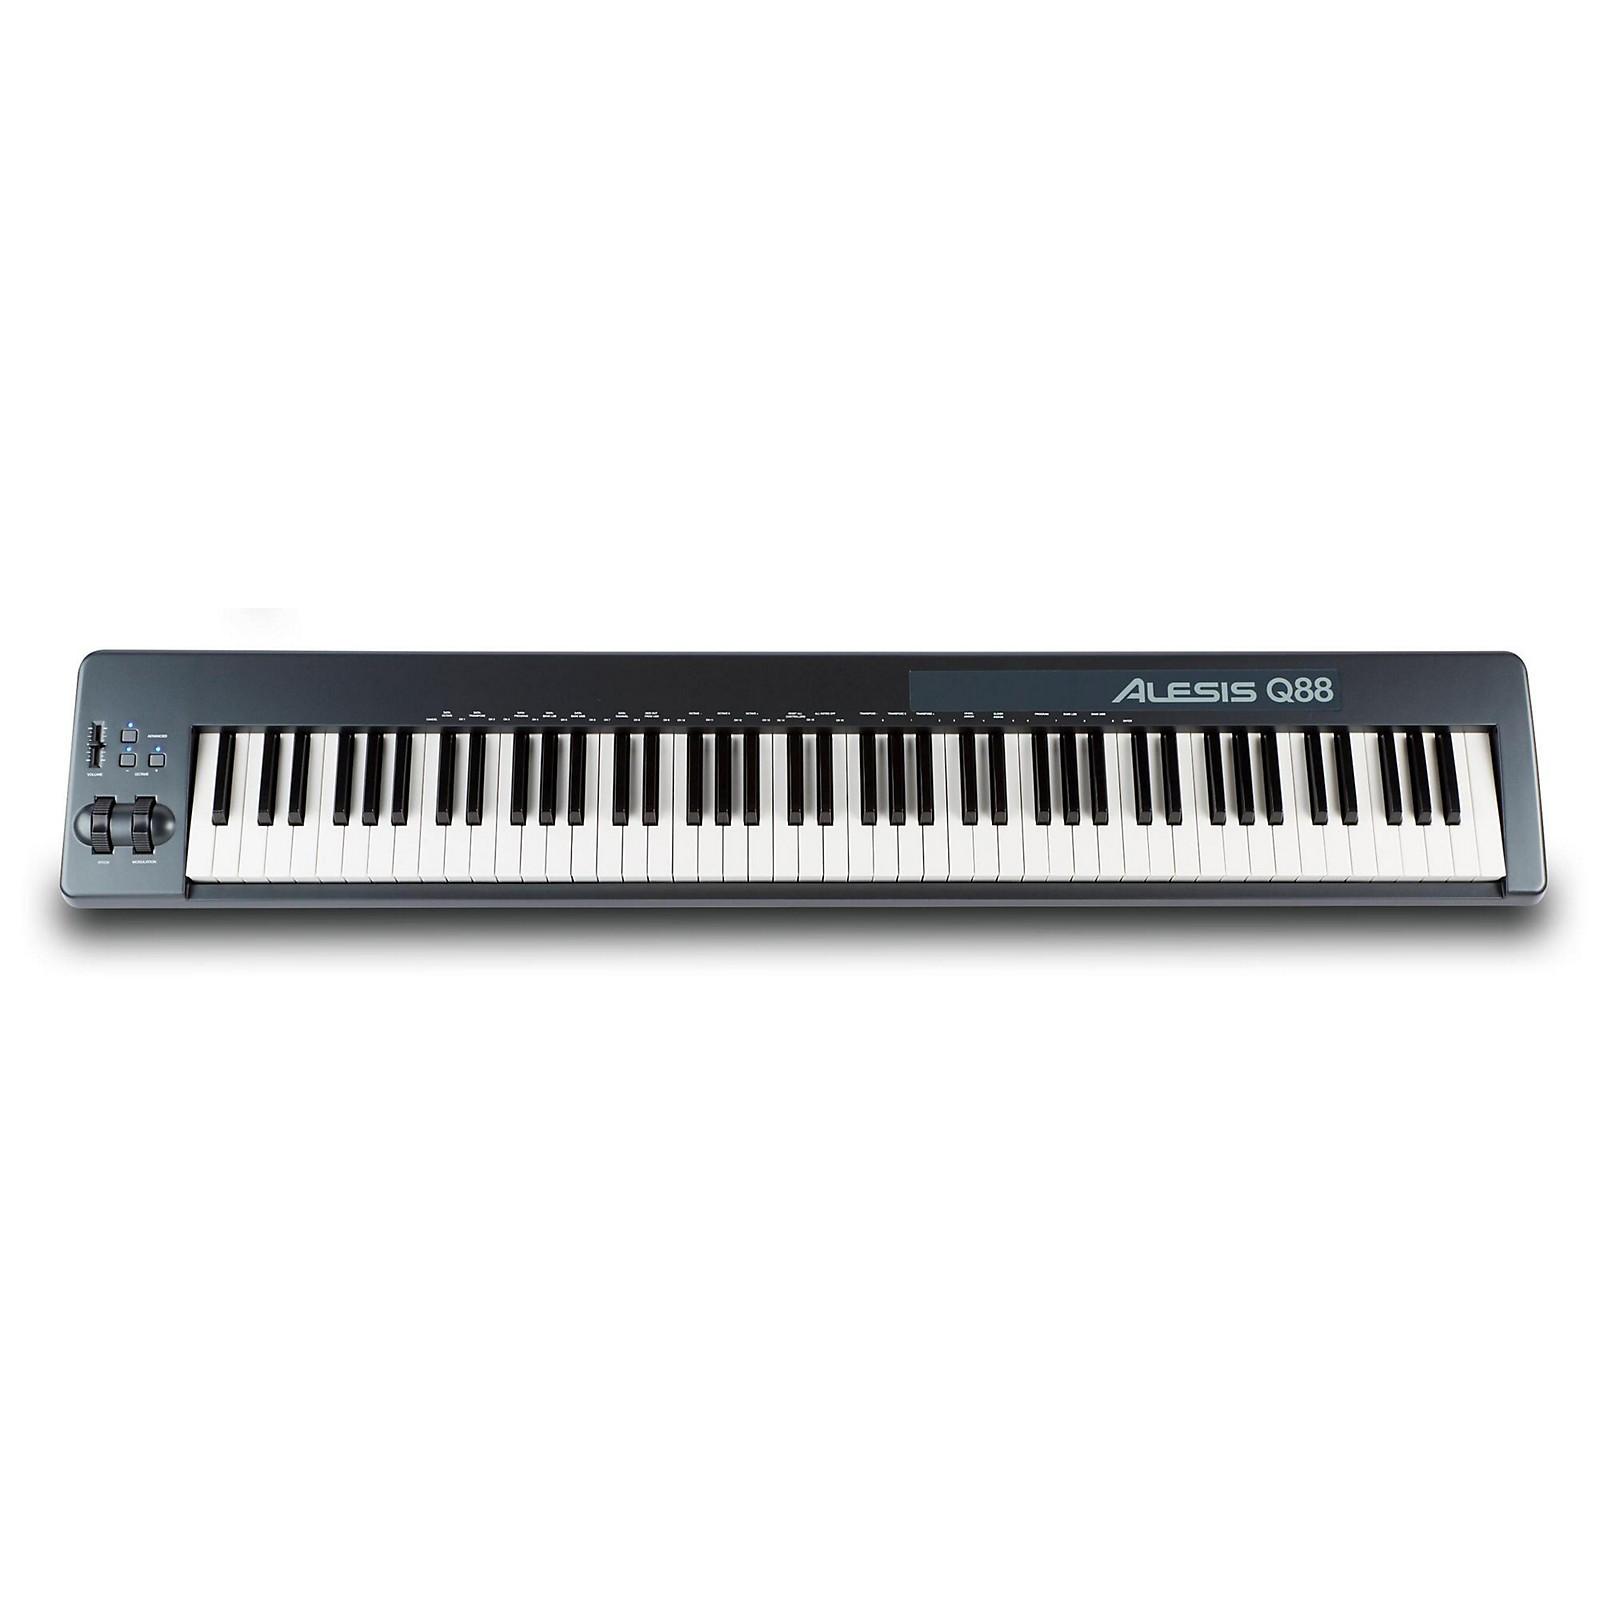 Open Box Alesis Q88 88-Key USB/MIDI Controller